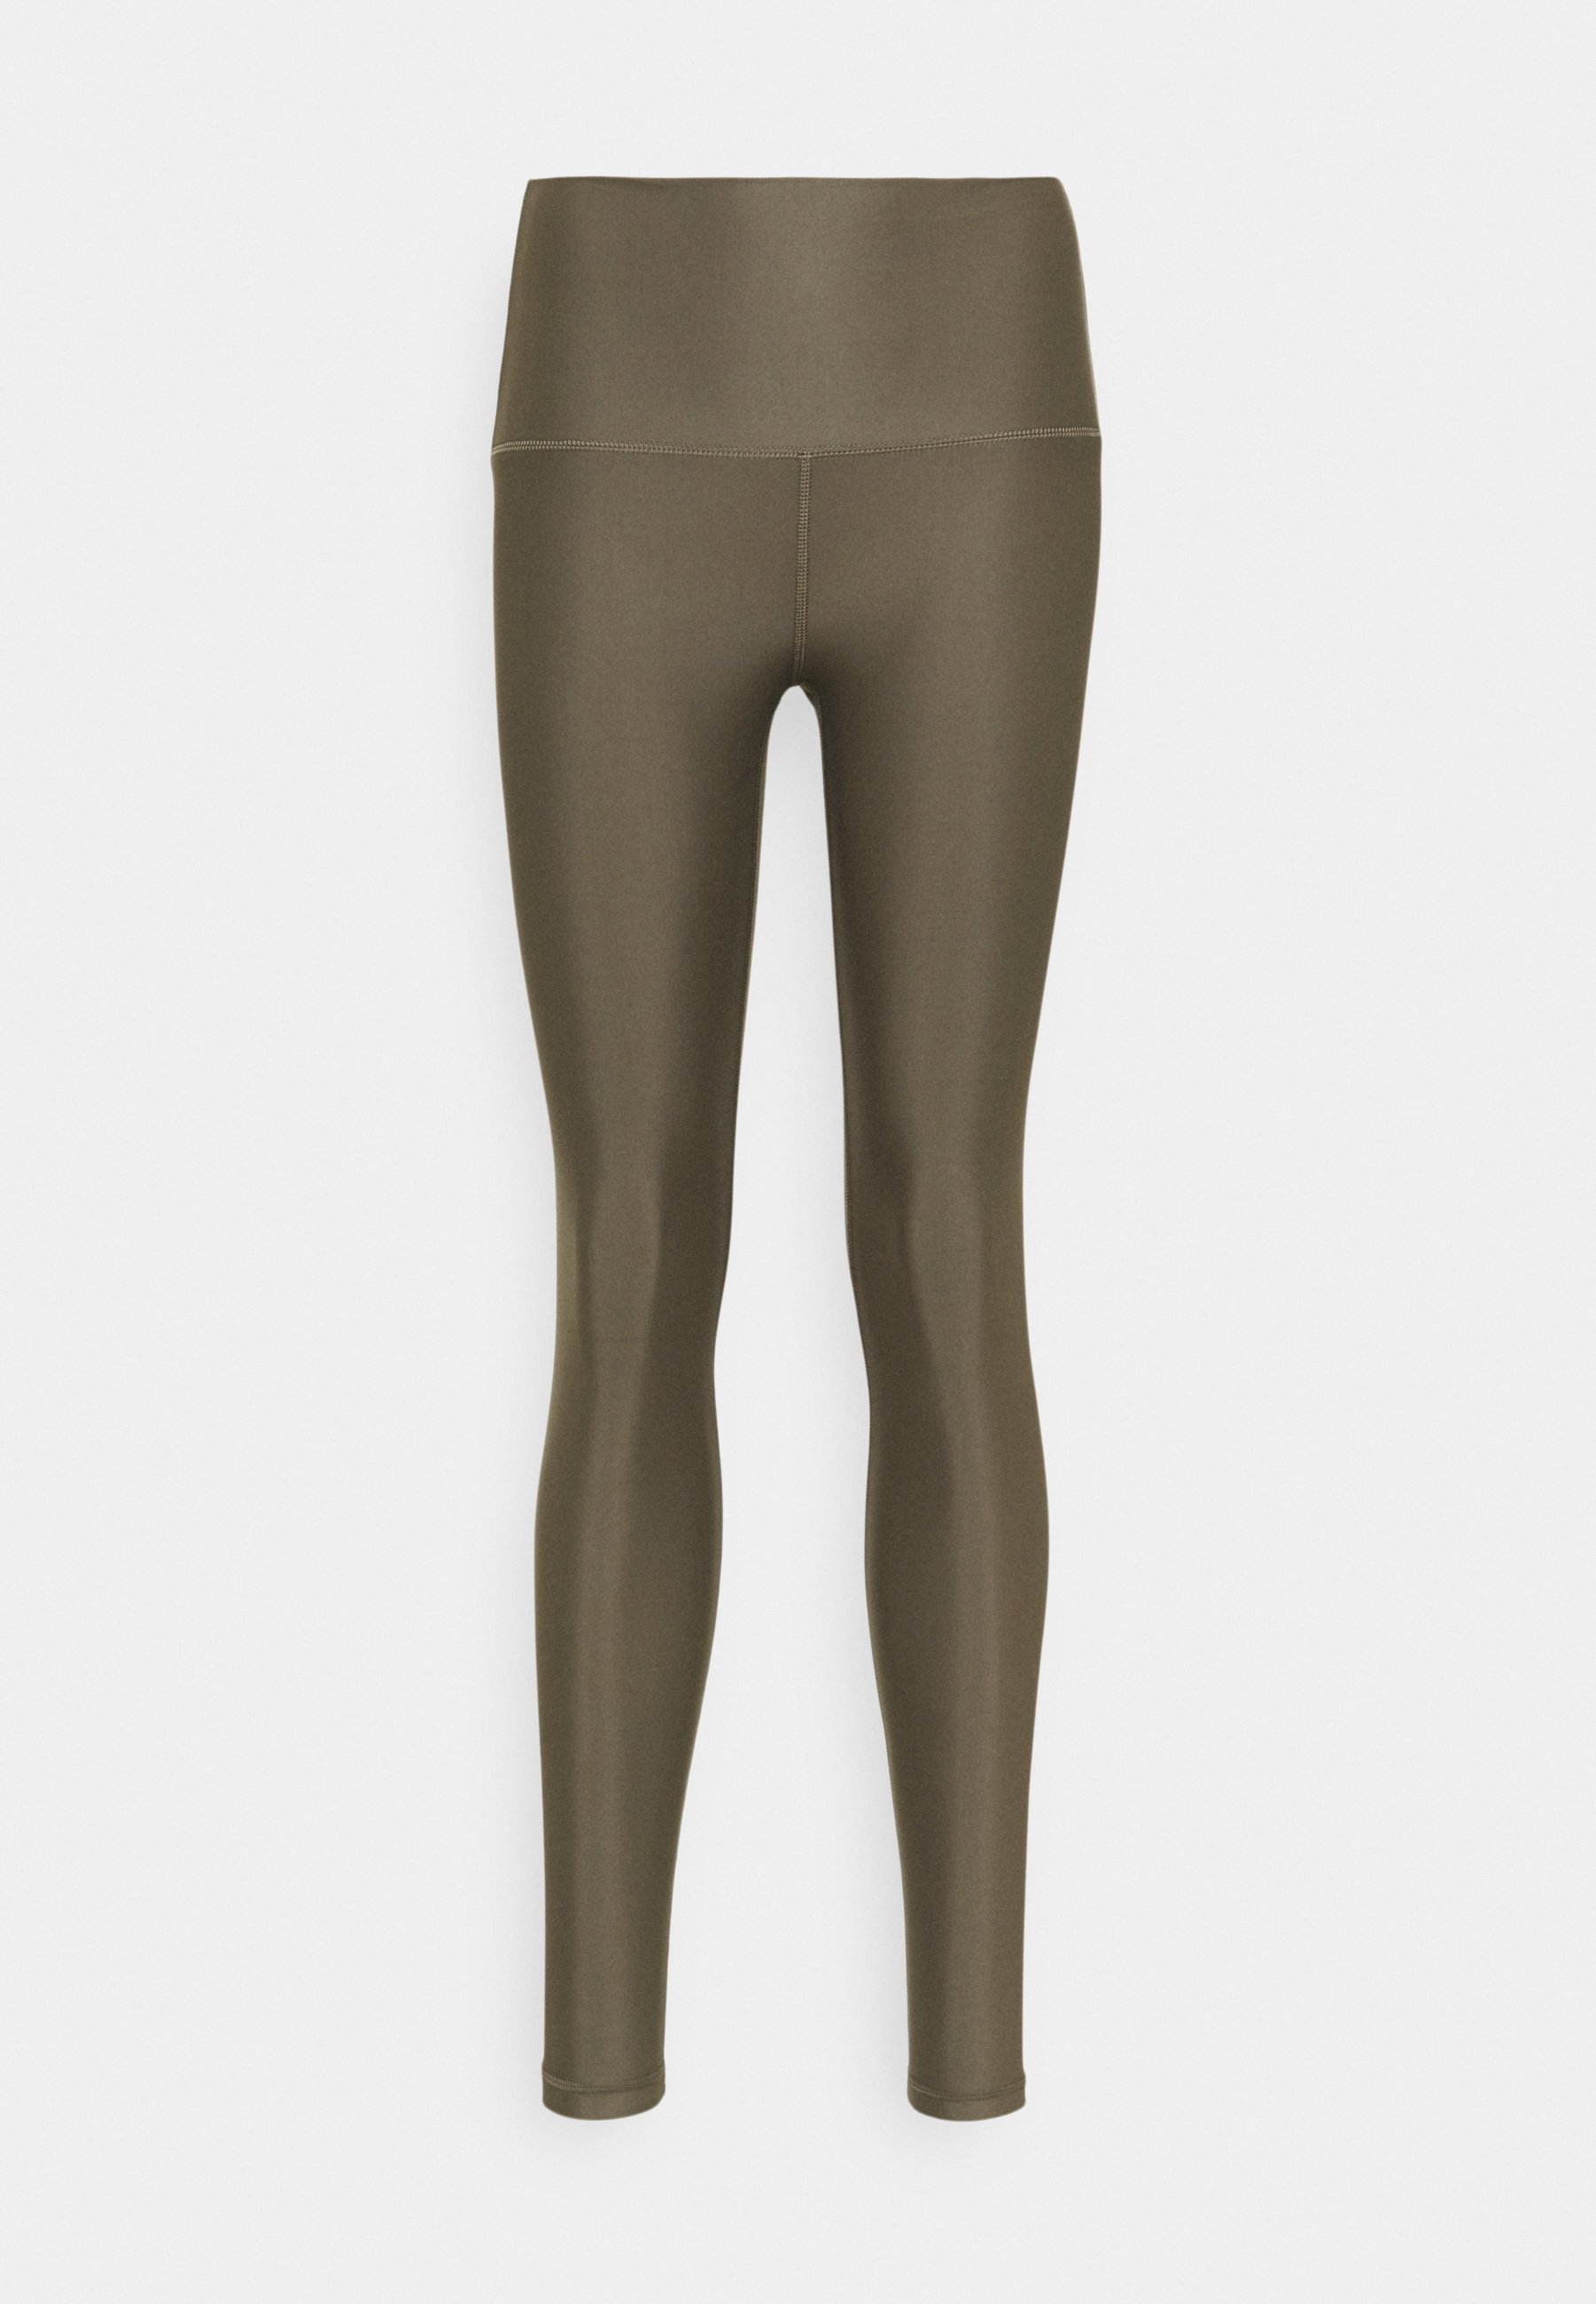 Women SHINE - Leggings - Trousers